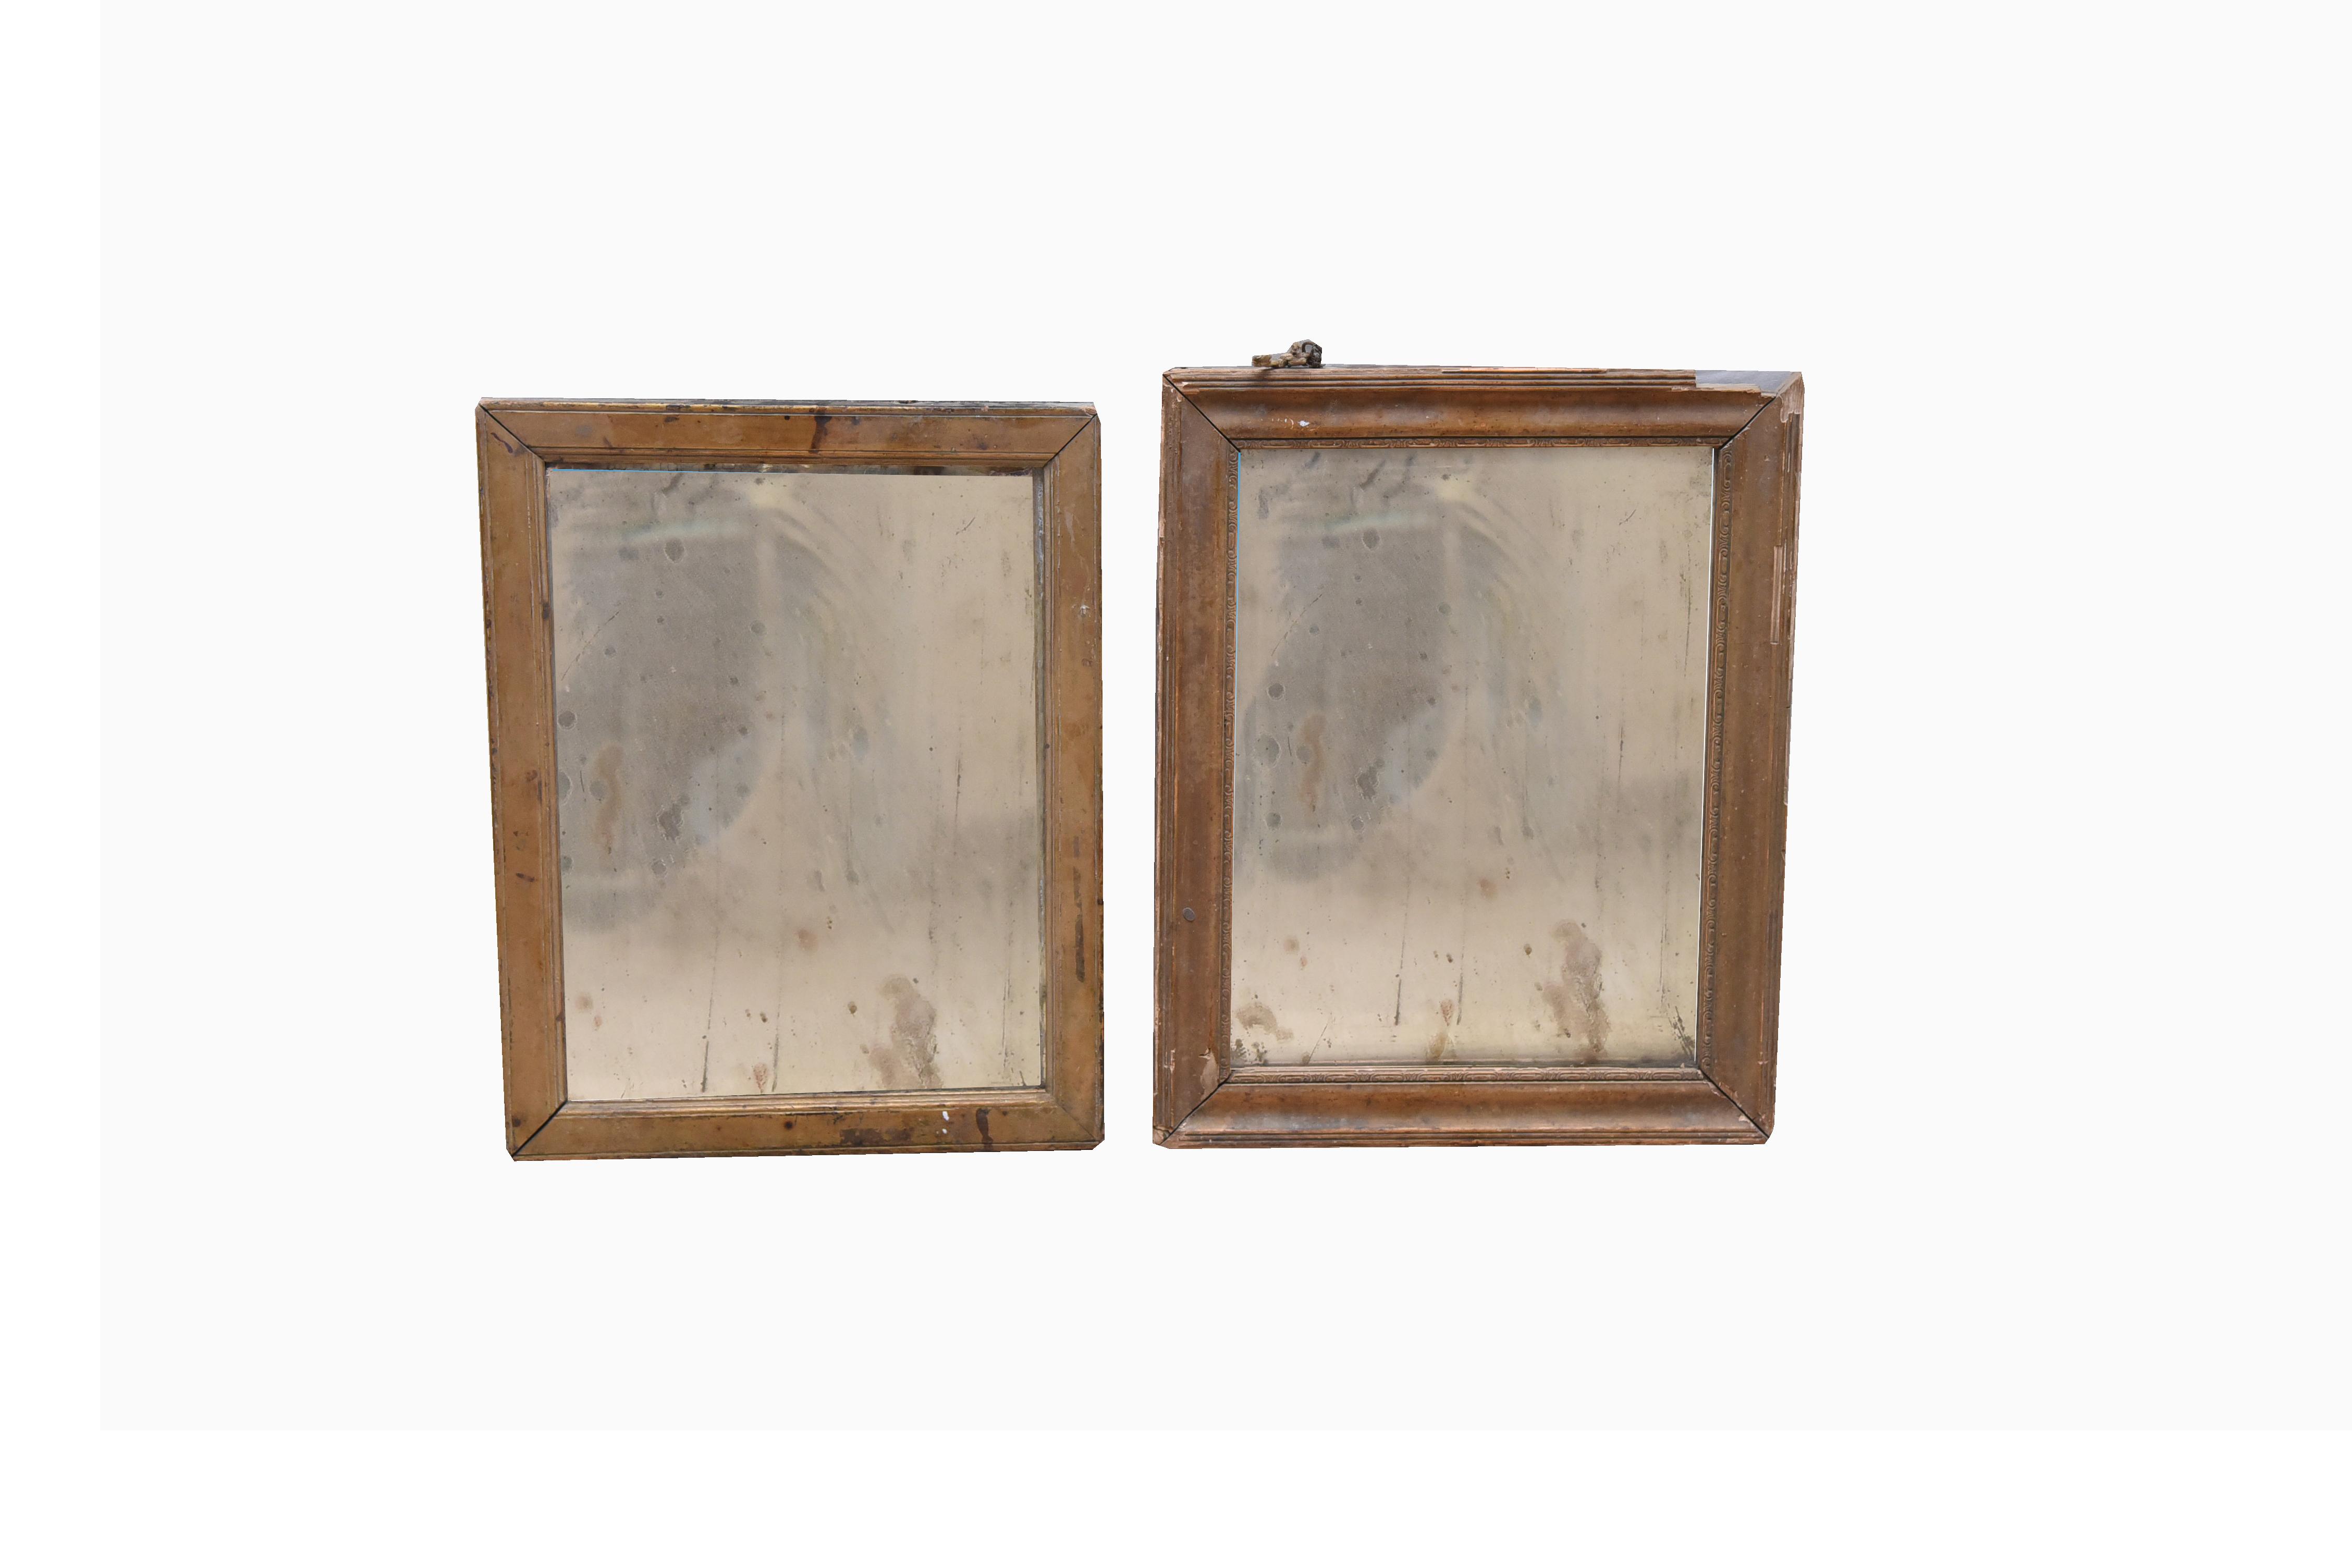 ANRA1840 - 39 x 2 x 49 cm